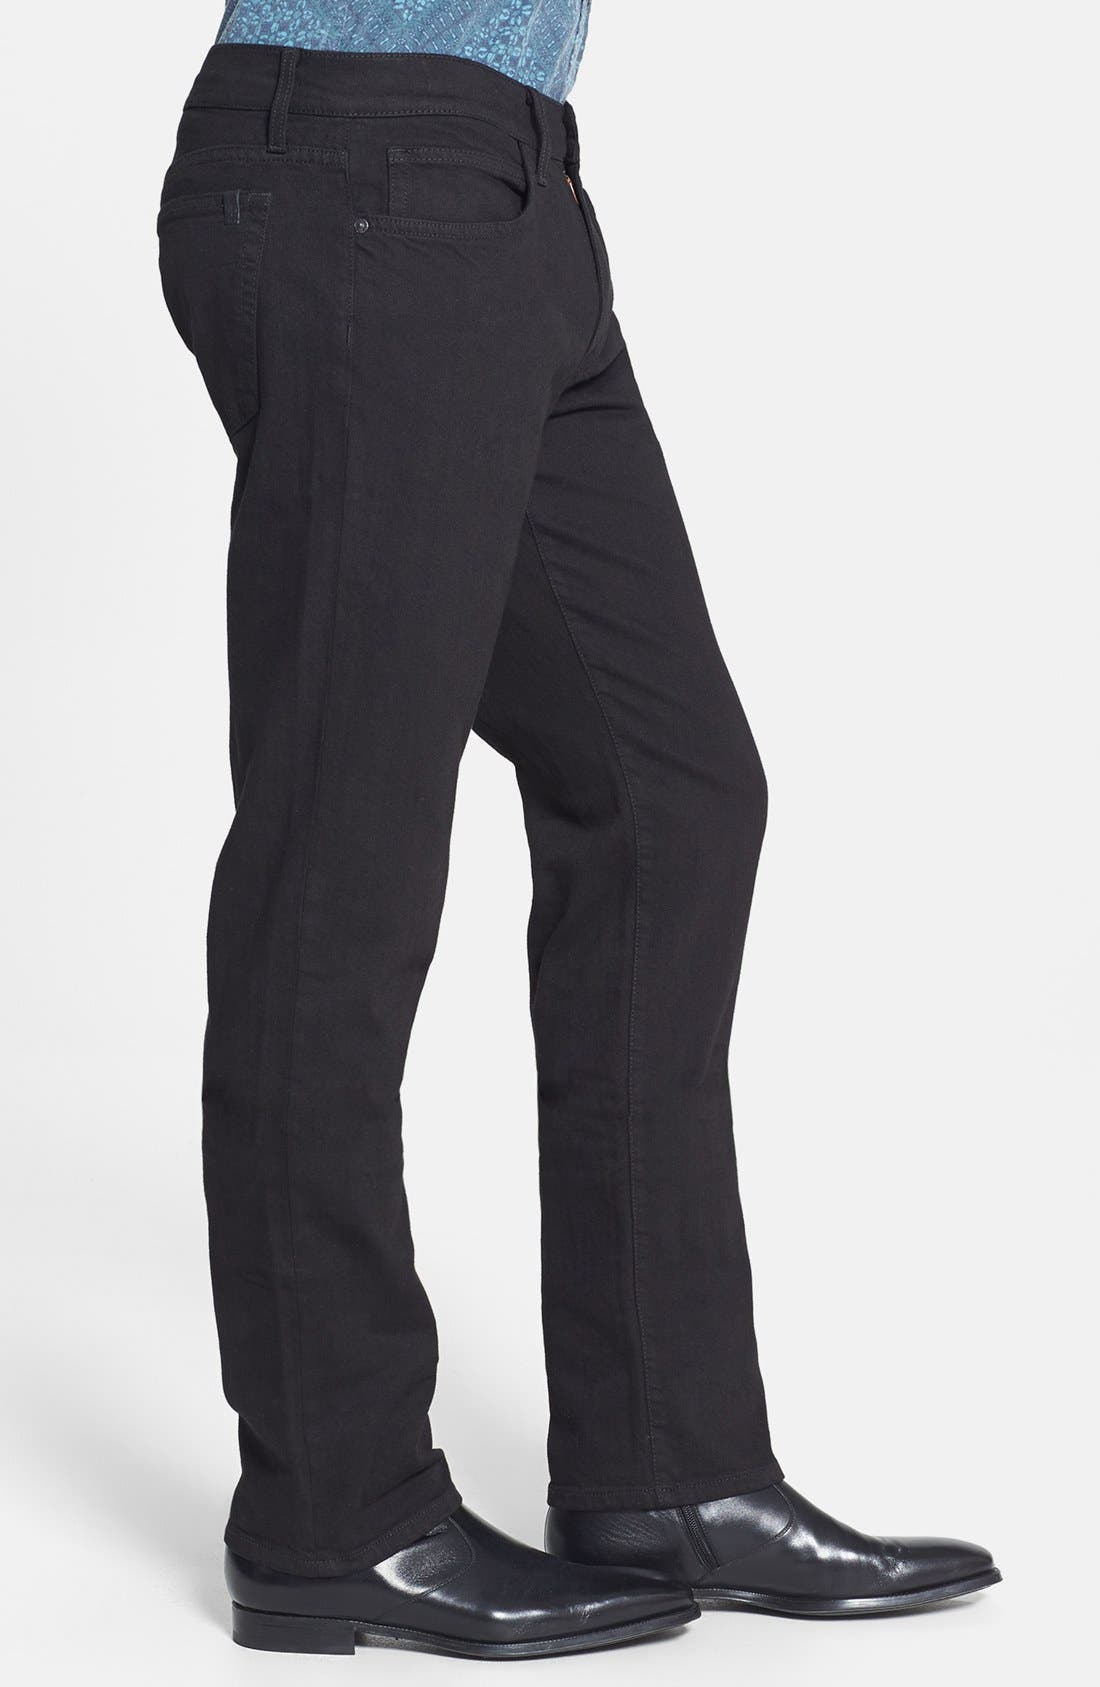 Alternate Image 3  - Joe's 'Brixton' Slim Fit Jeans (Jet Black)